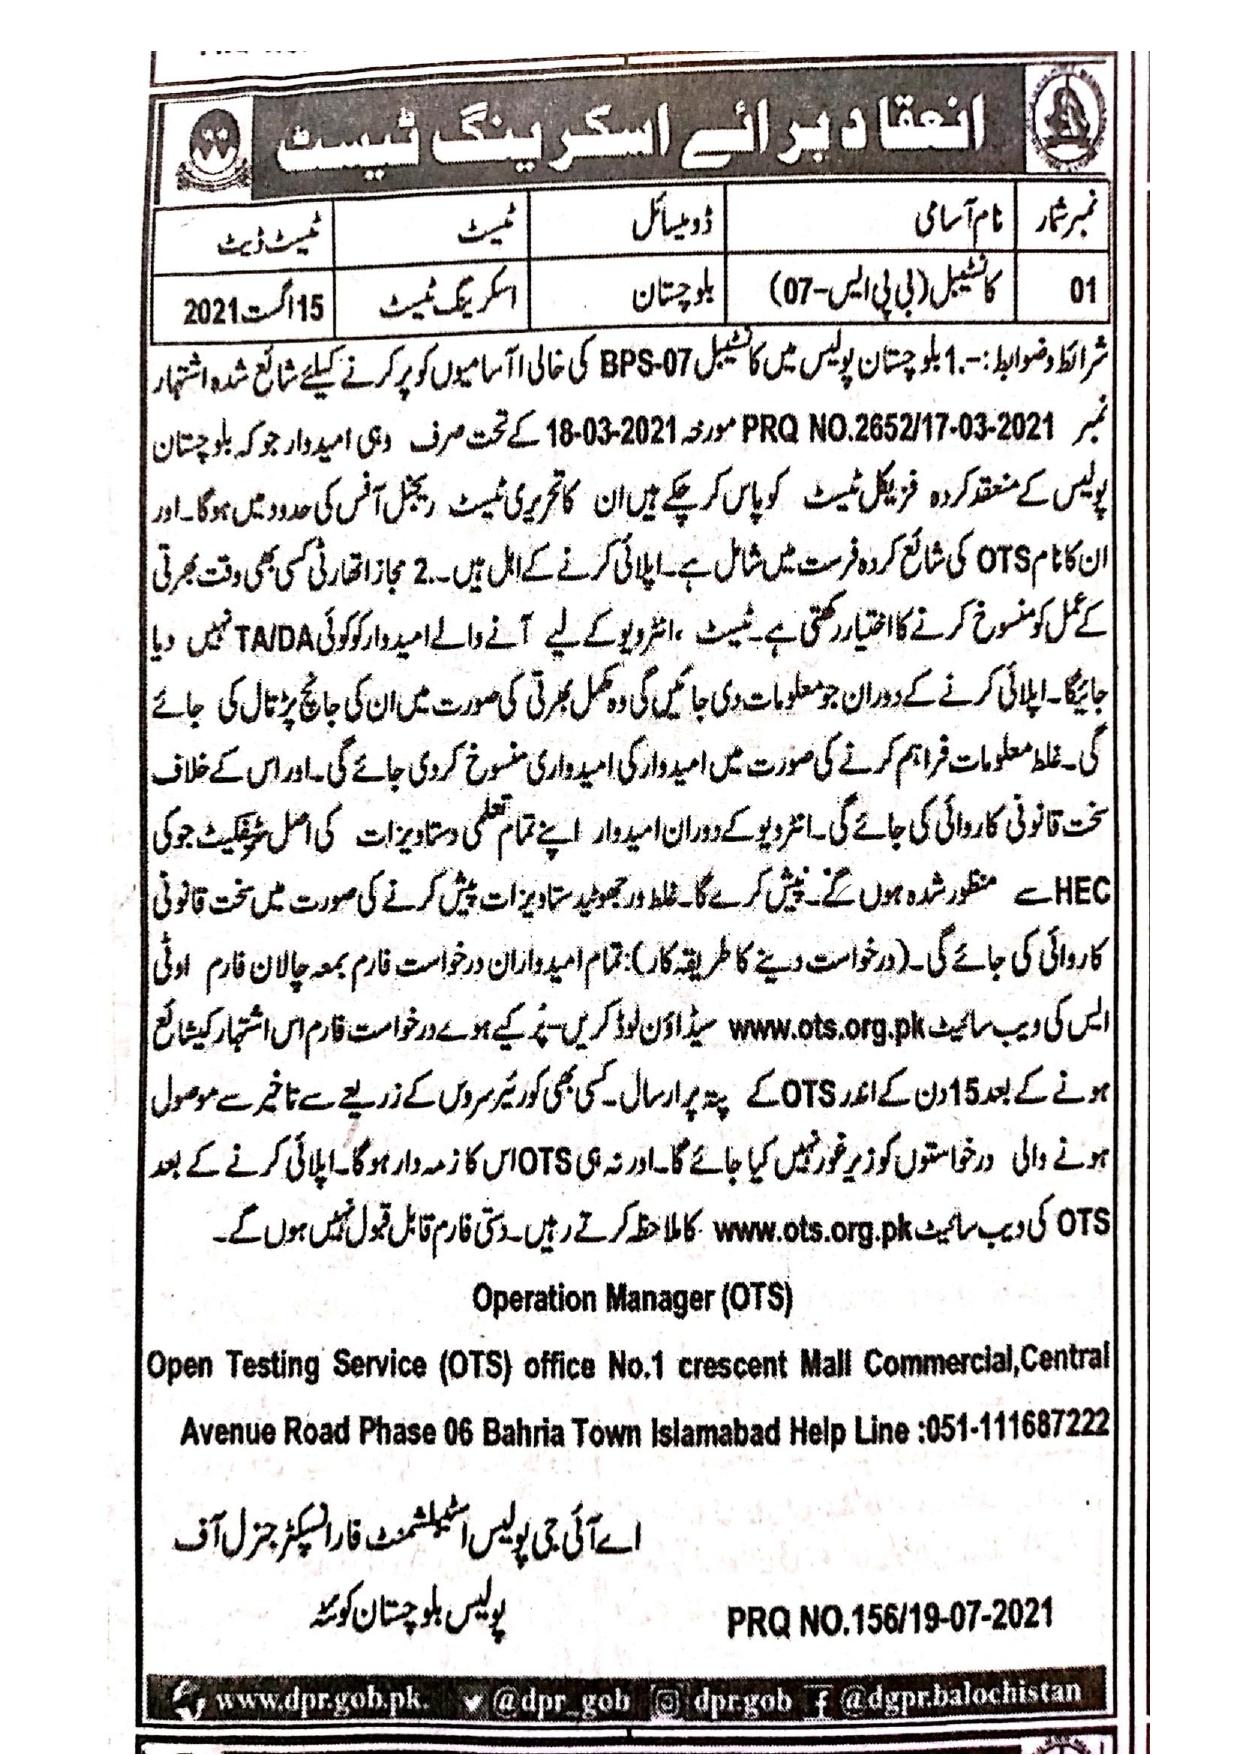 Balochistan Police OTS Jobs Apply Online Roll No Slip